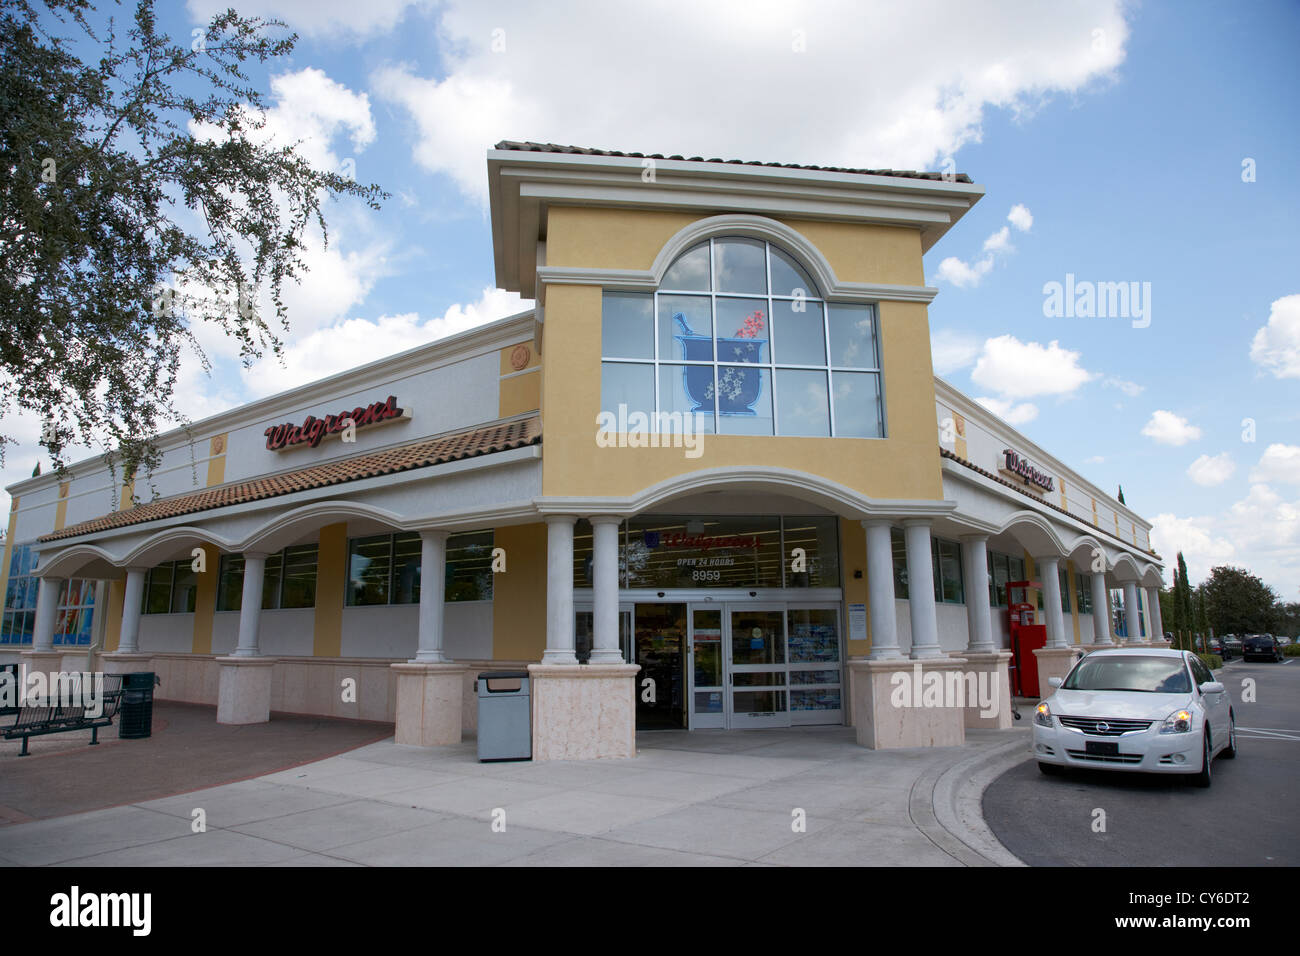 Walgreens drug store orlando florida usa Photo Stock